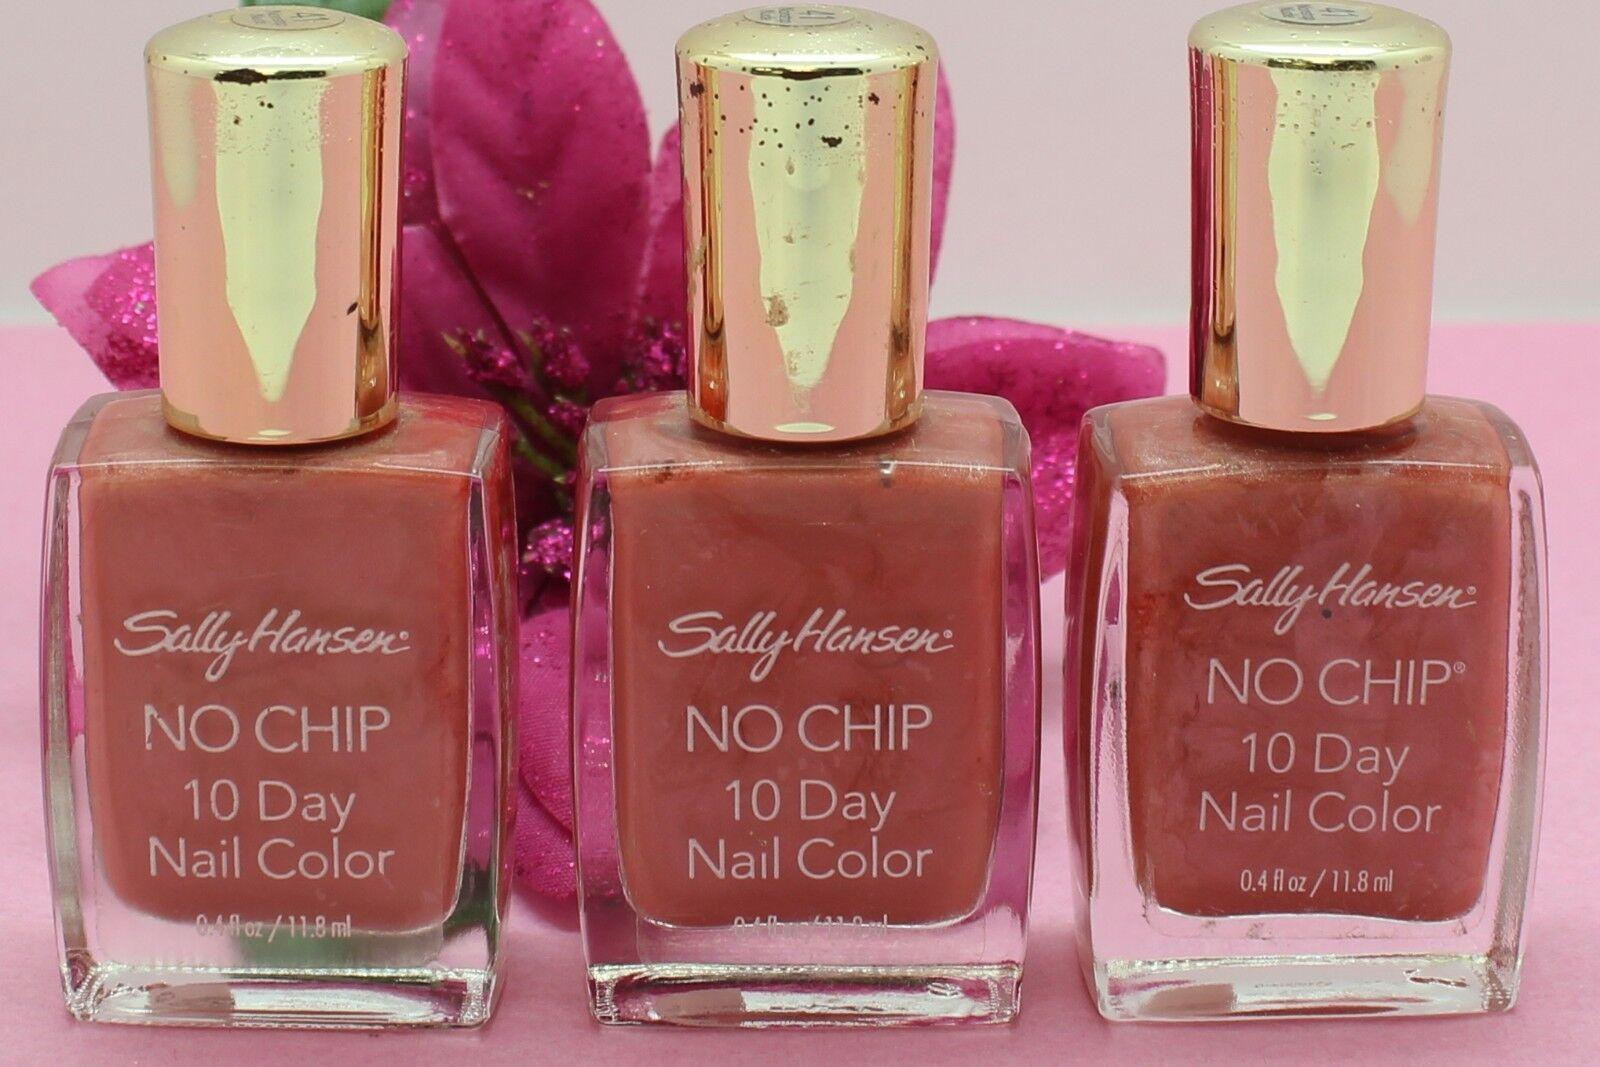 Sally Hansen No Chip 10 Day Nail Color Nonstop Nude 41 | eBay